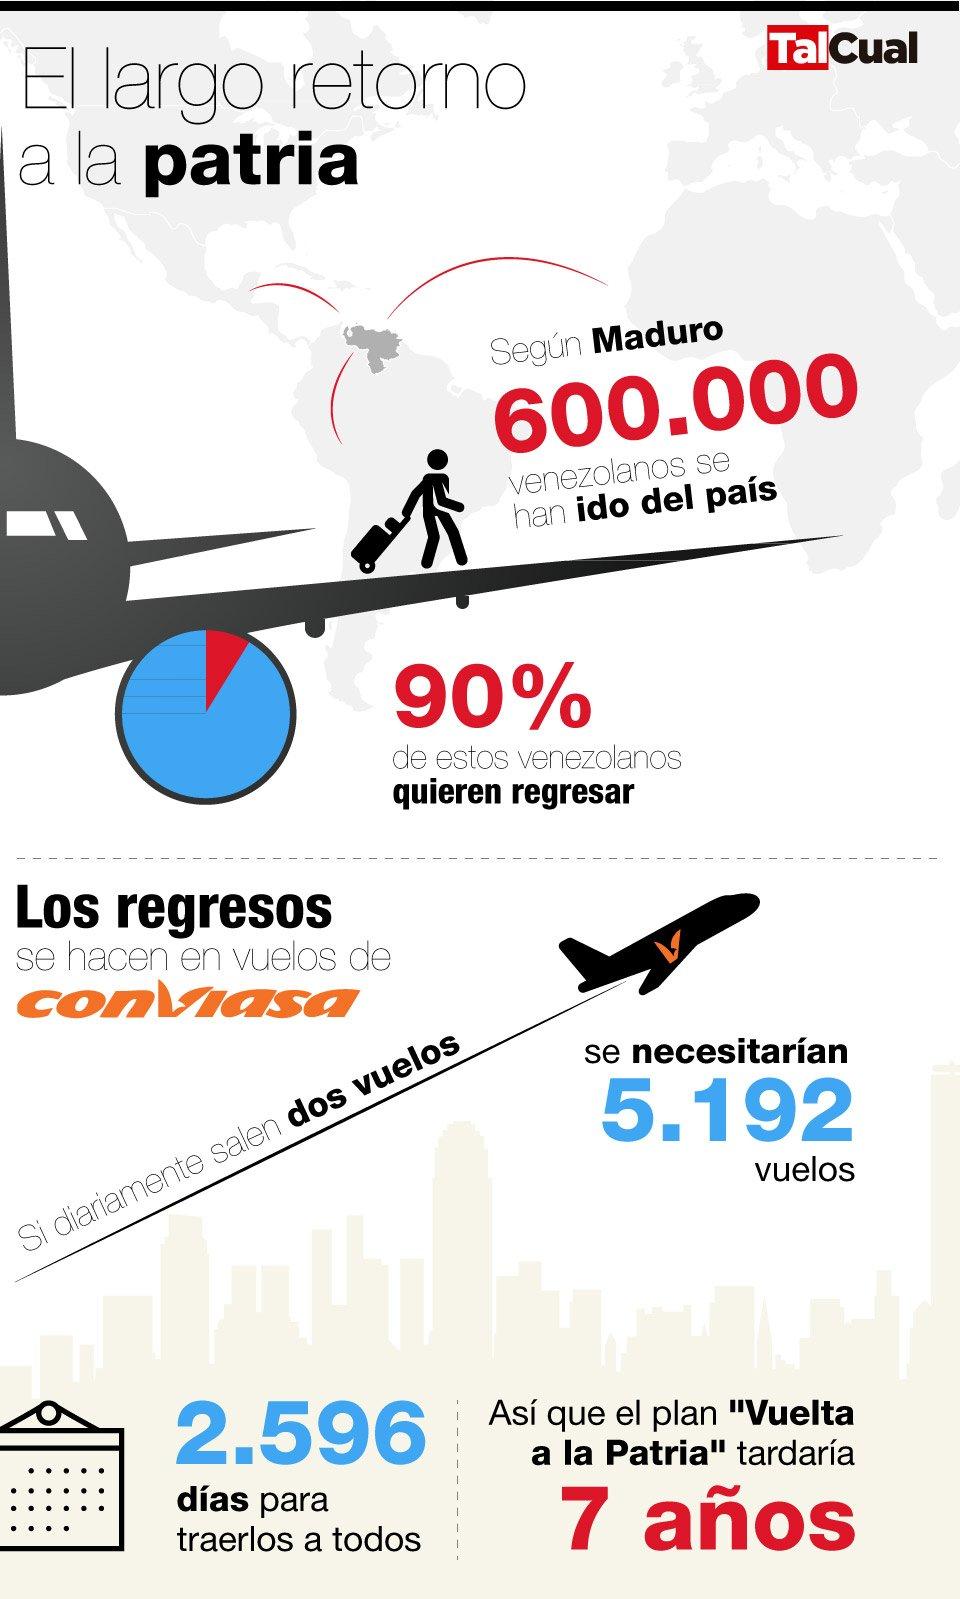 Emigración o diáspora venezolana ? Scaletowidth#tl-1094736737294352386;'